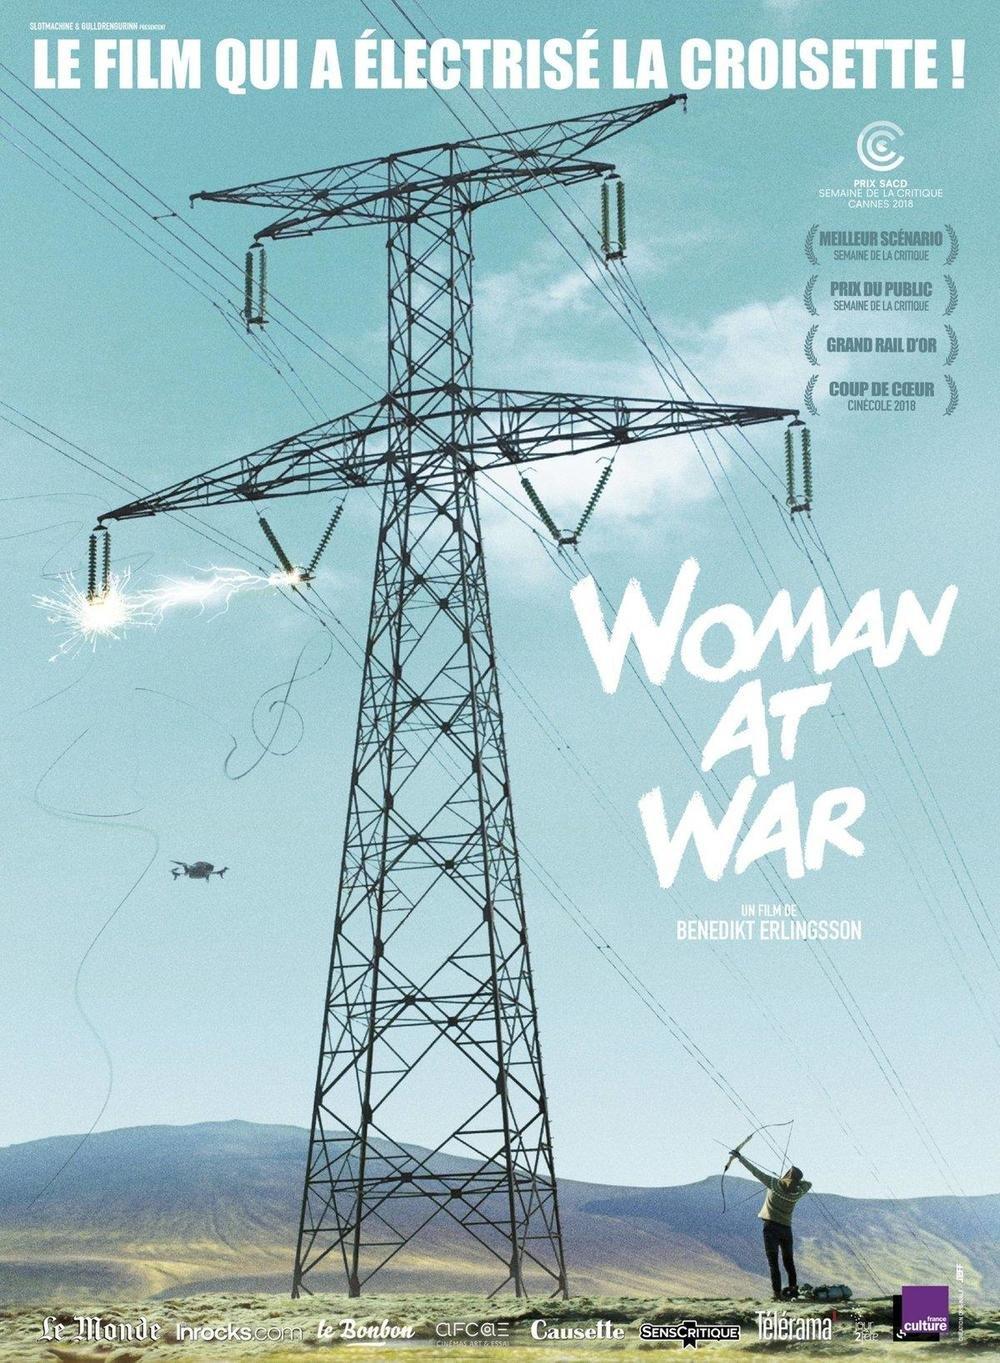 affiche du film Woman at war